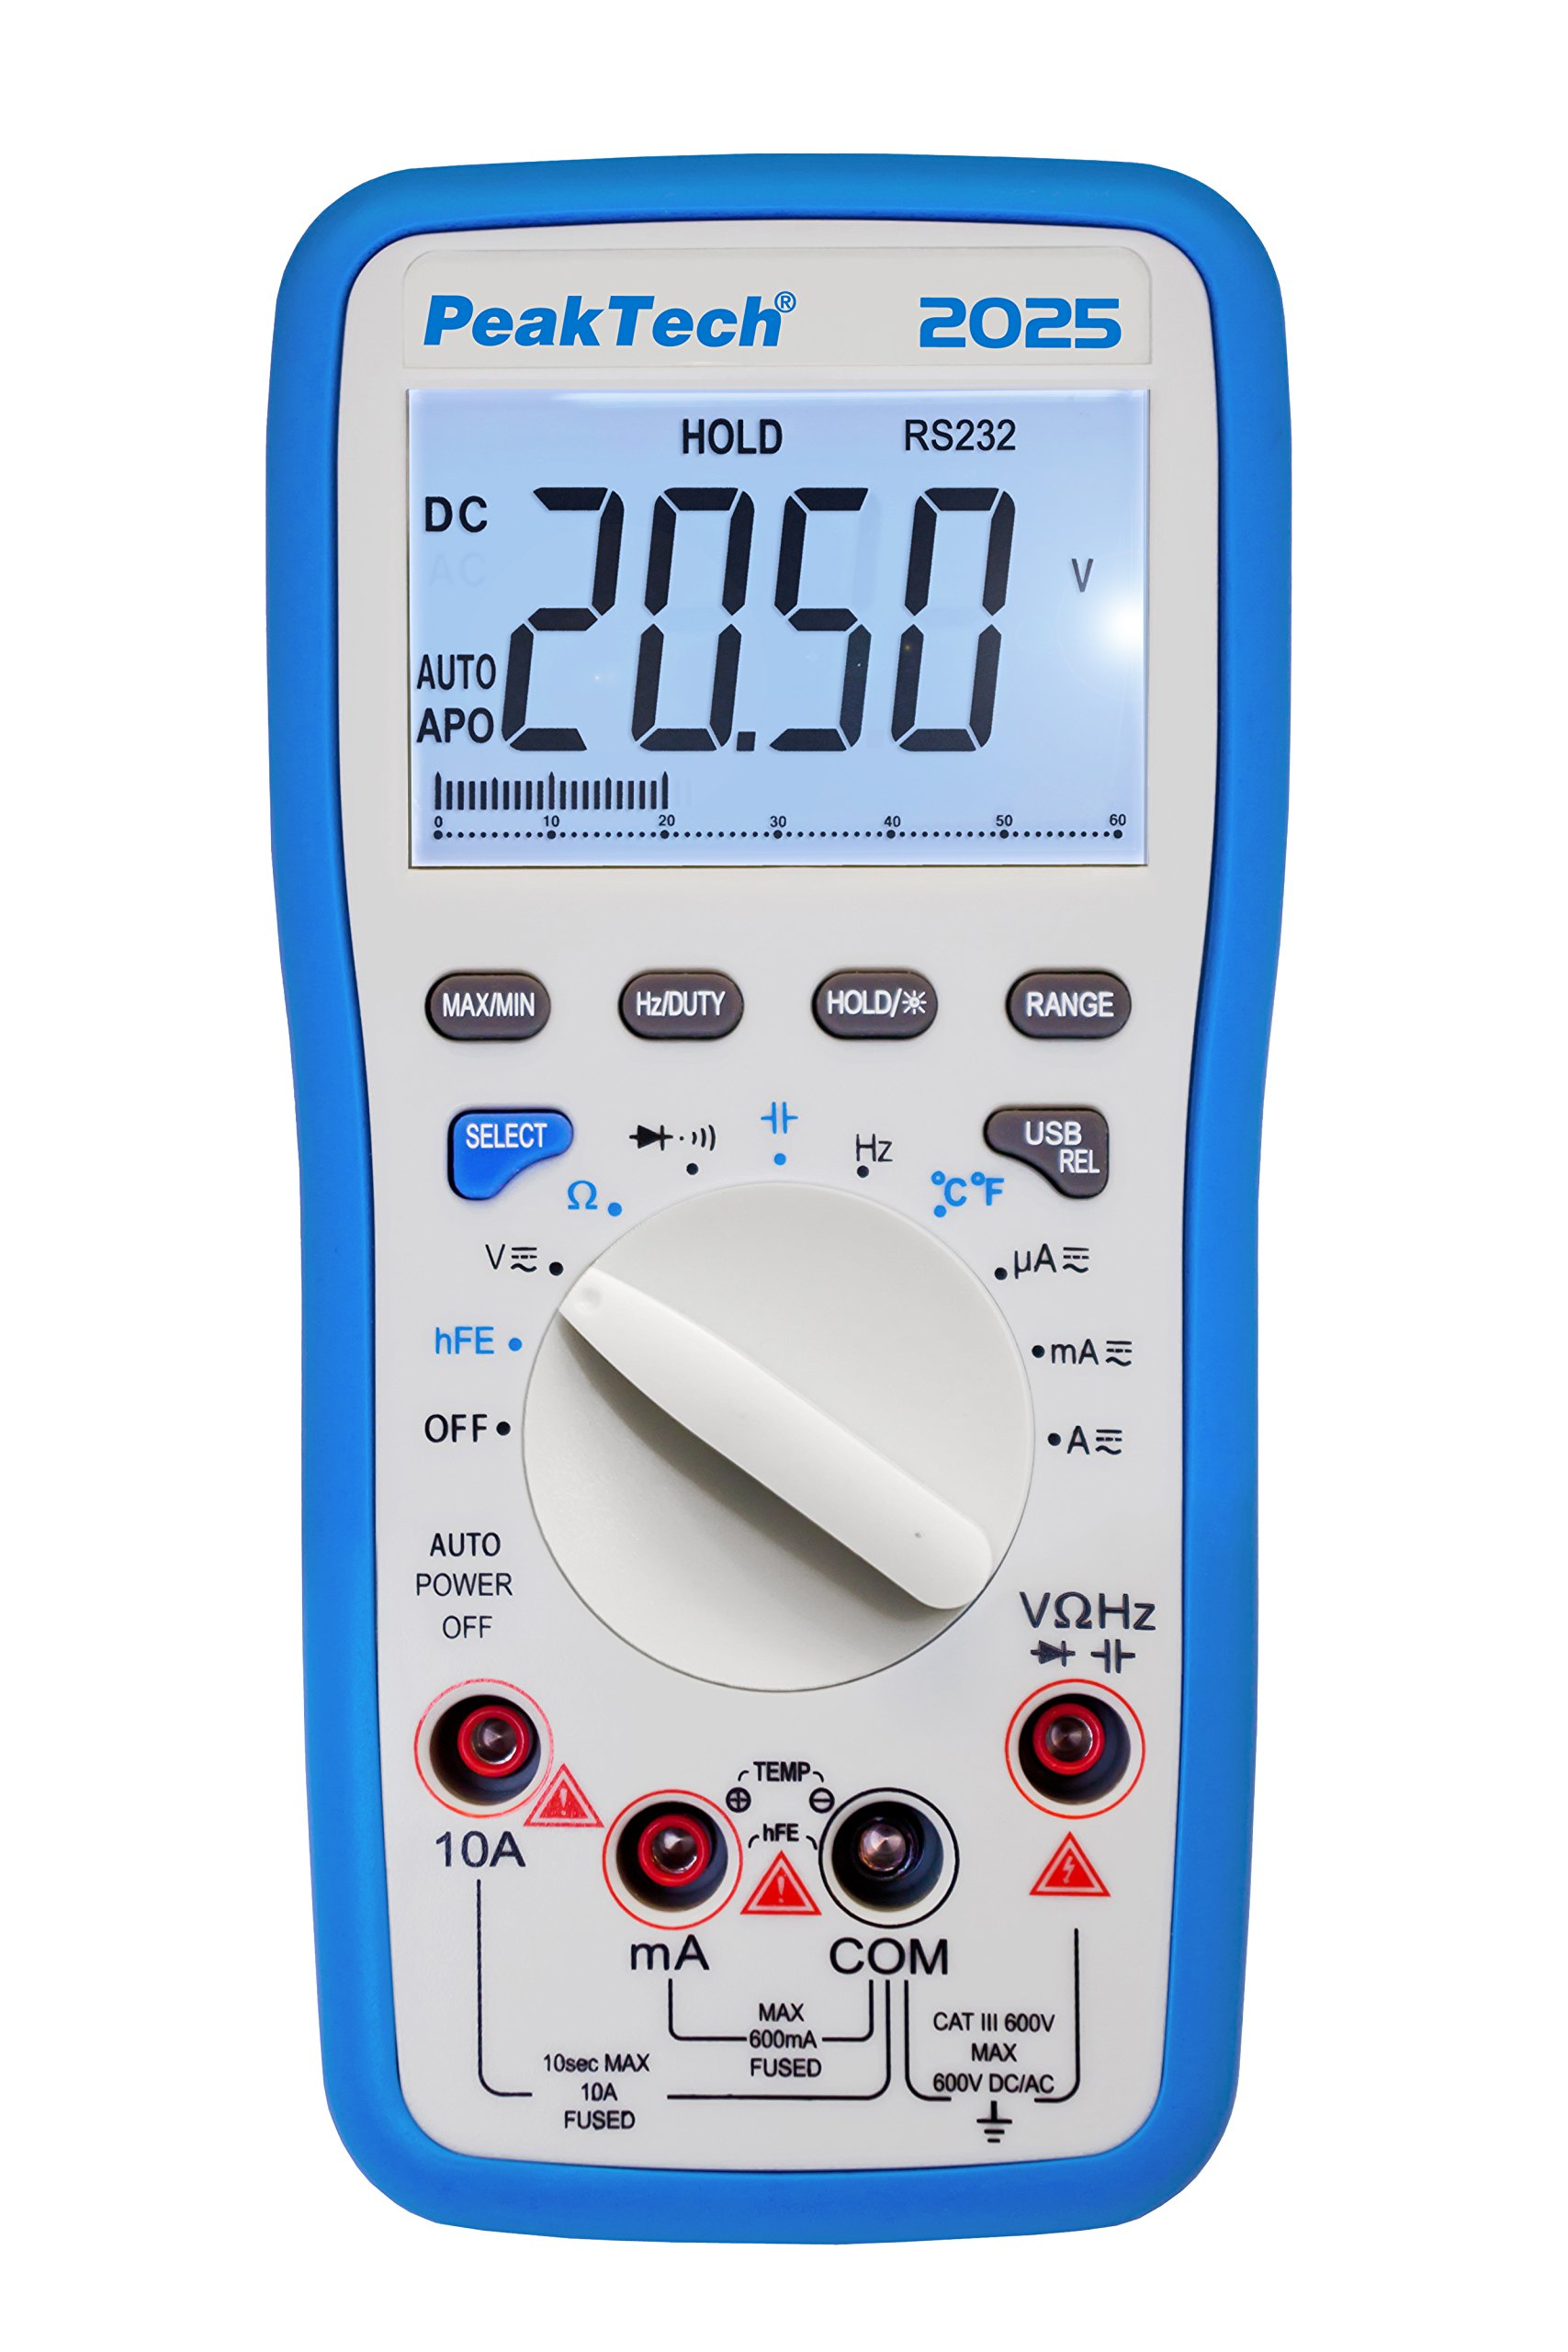 PeakTech Digital Multimeter 2025